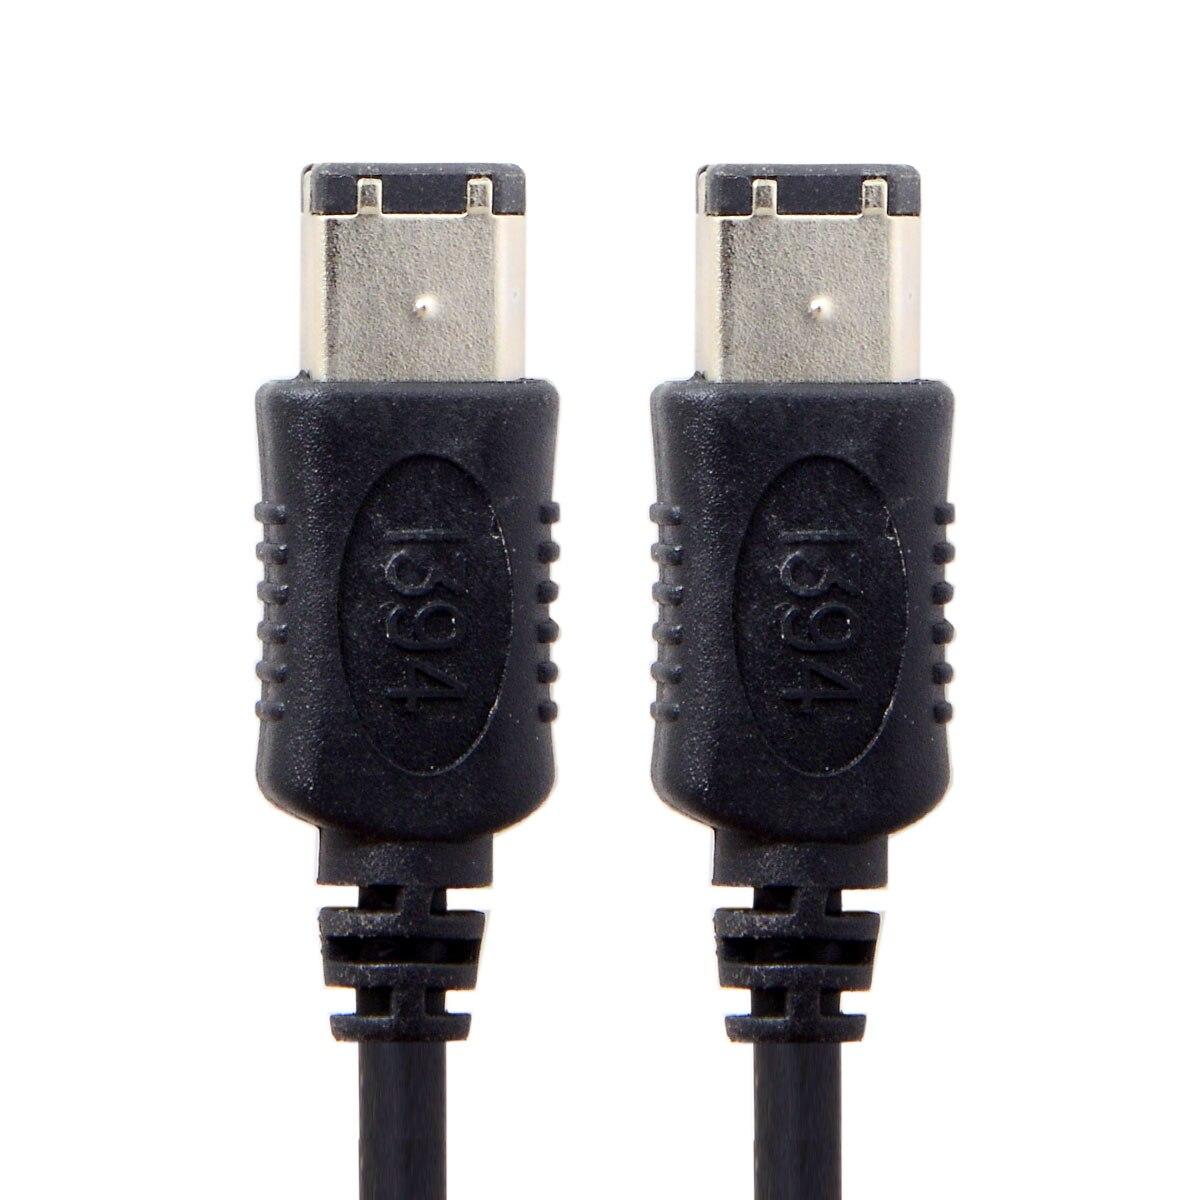 10 pçs/lote CY FW-016-1.6M 6 Pin IEEE 1394 IEEE 1394 iLink Firewire 400 6 6 6pin Cabo IEEE 1394 1.8M Preto